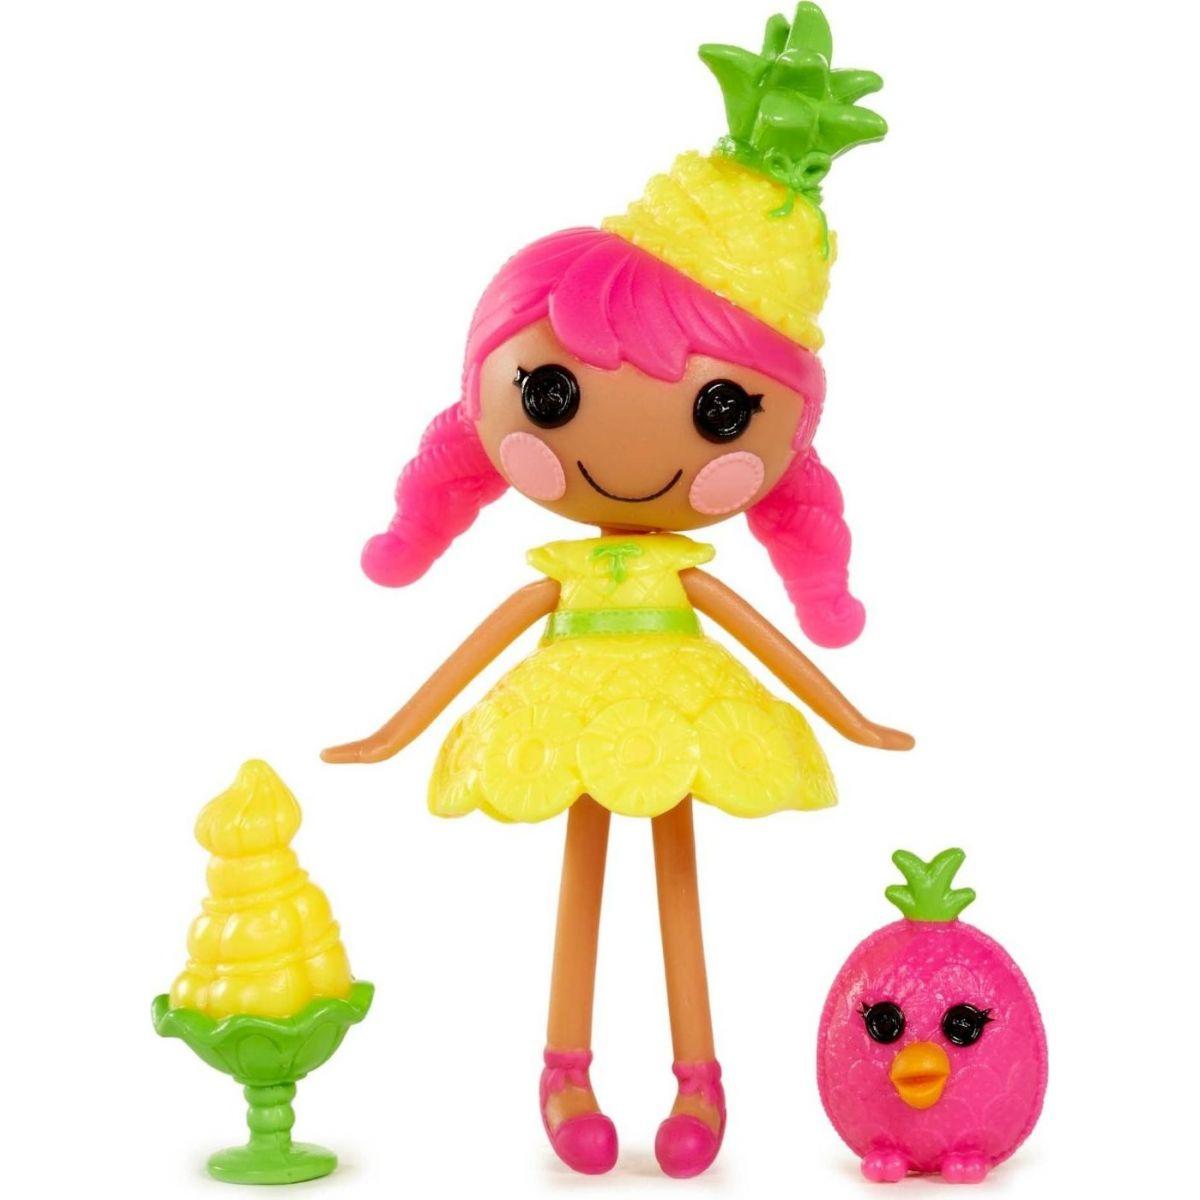 Mini Lalaloopsy Panenka Fruit Collection - 542162 Pina Tropi-Callie